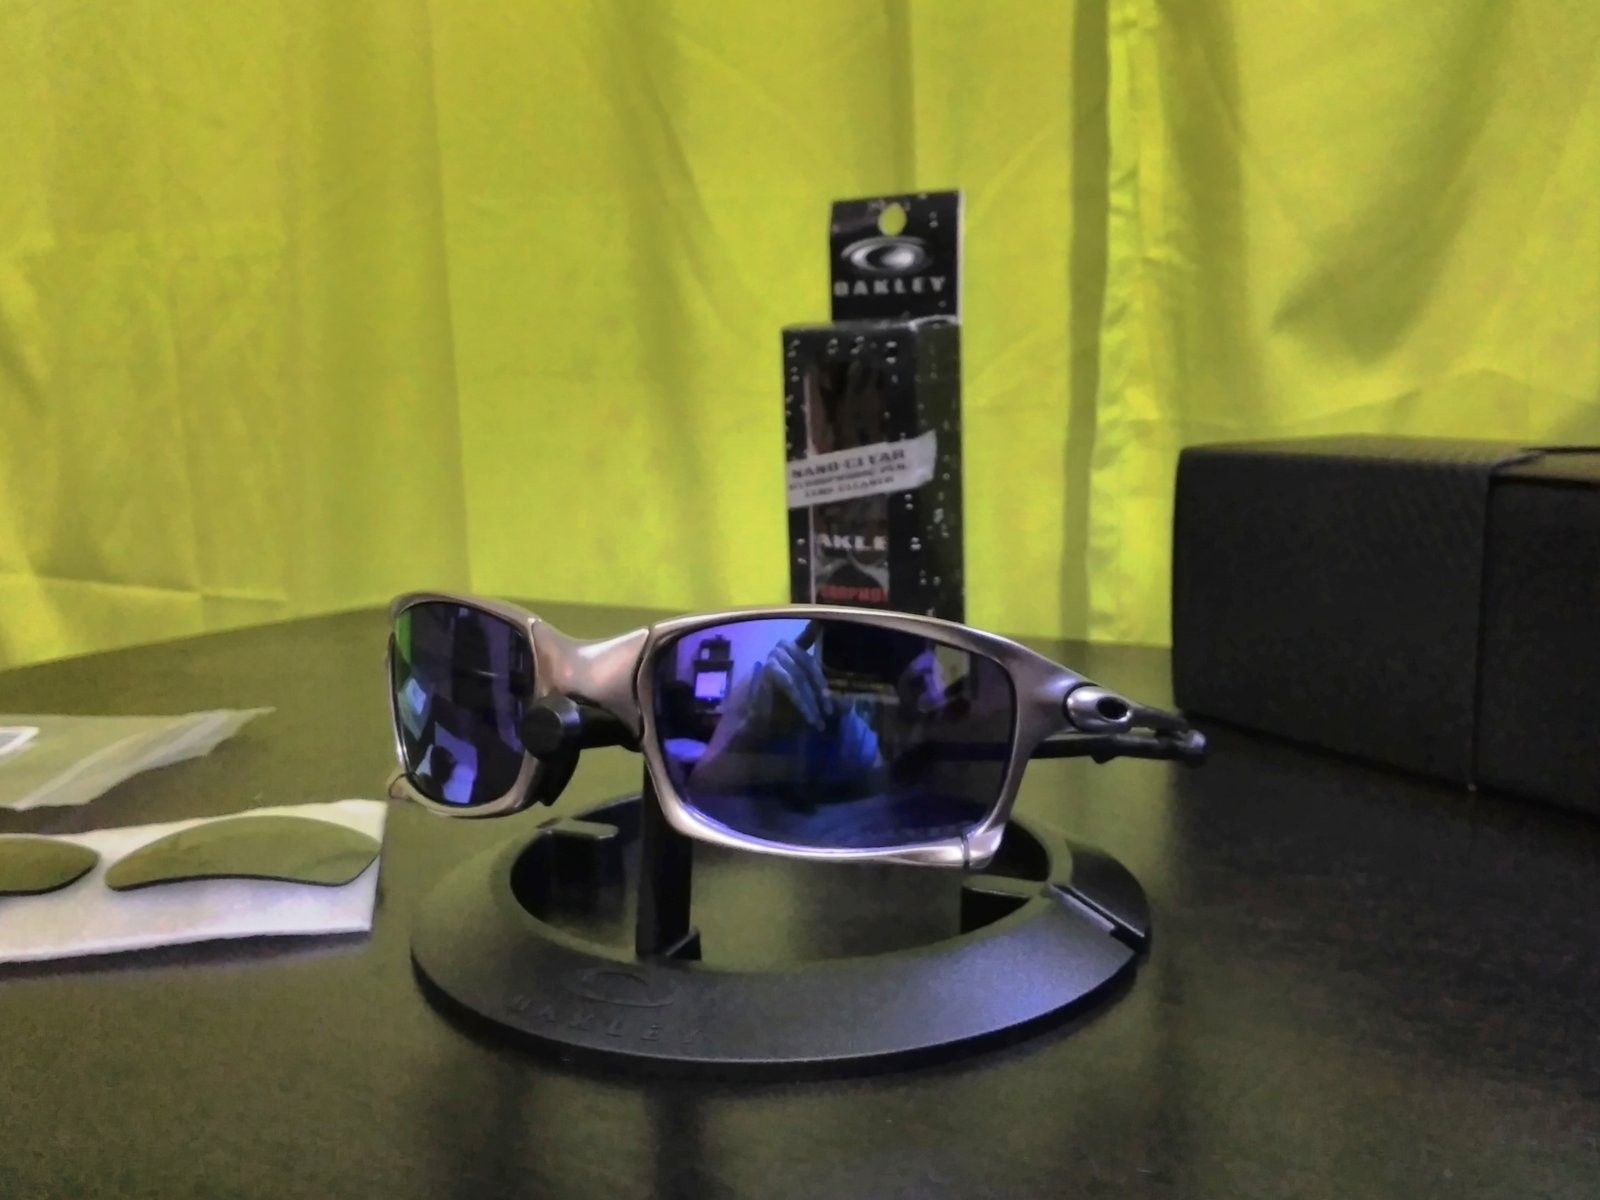 Xsquared Plasma with freebies $500 OBO - Image4.jpg